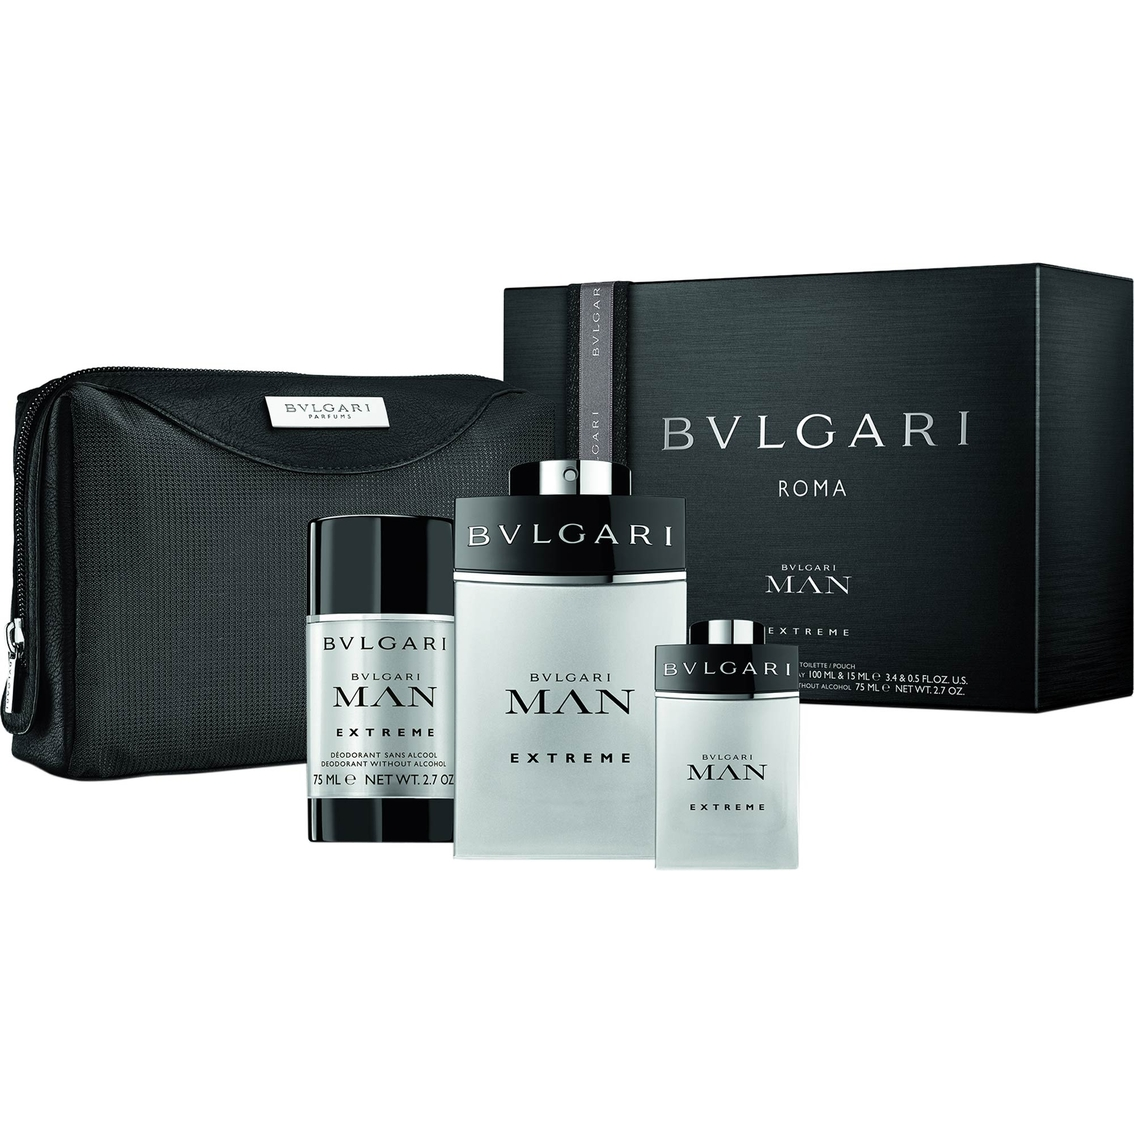 Bvlgari Gift Set Bvlgari Man Extreme By Bvlgari